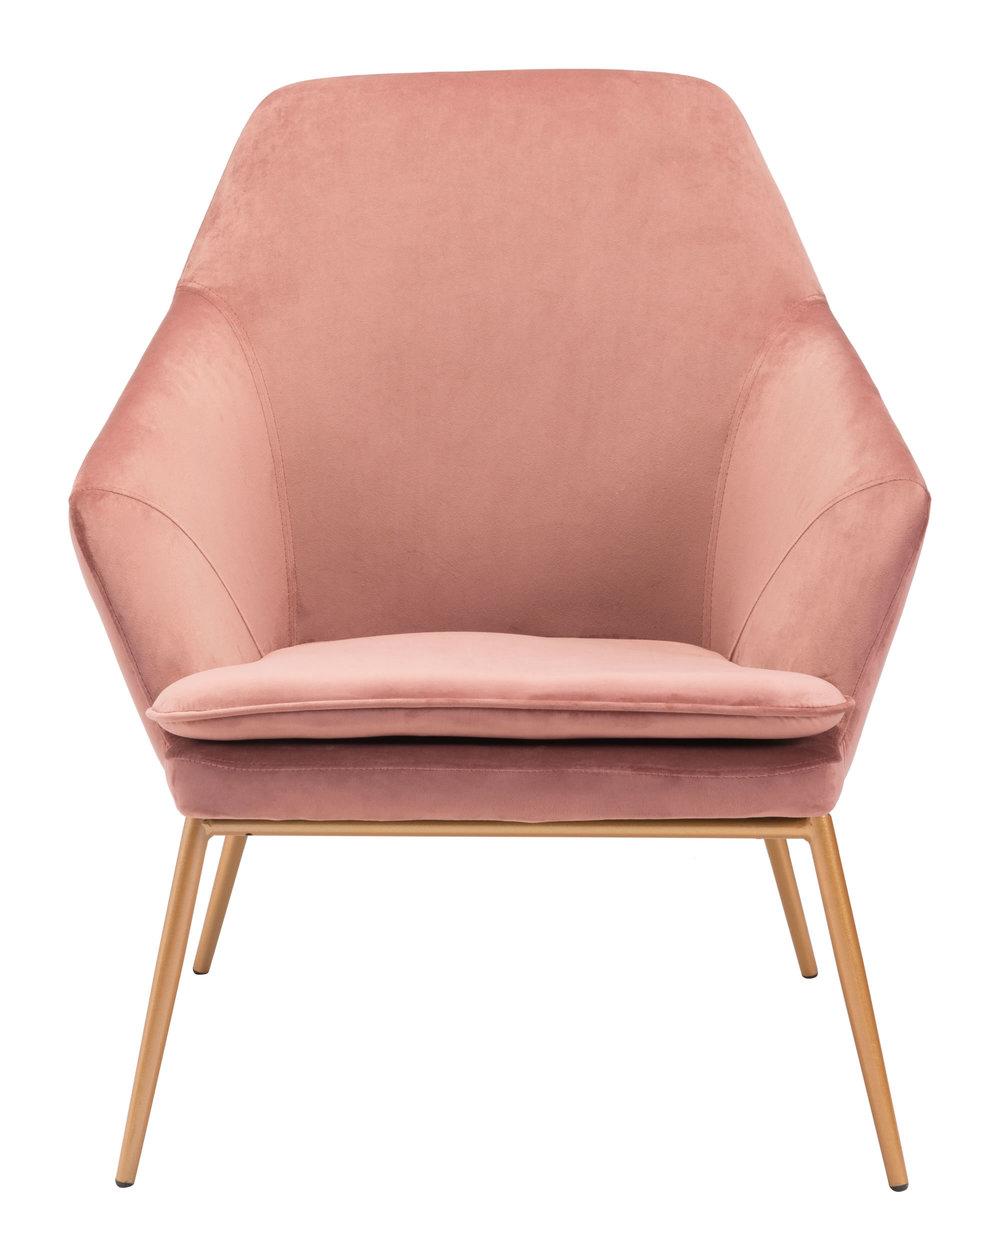 ZUO MODERN CONTEMPORARY, INC - Debonair Arm Chair Pink